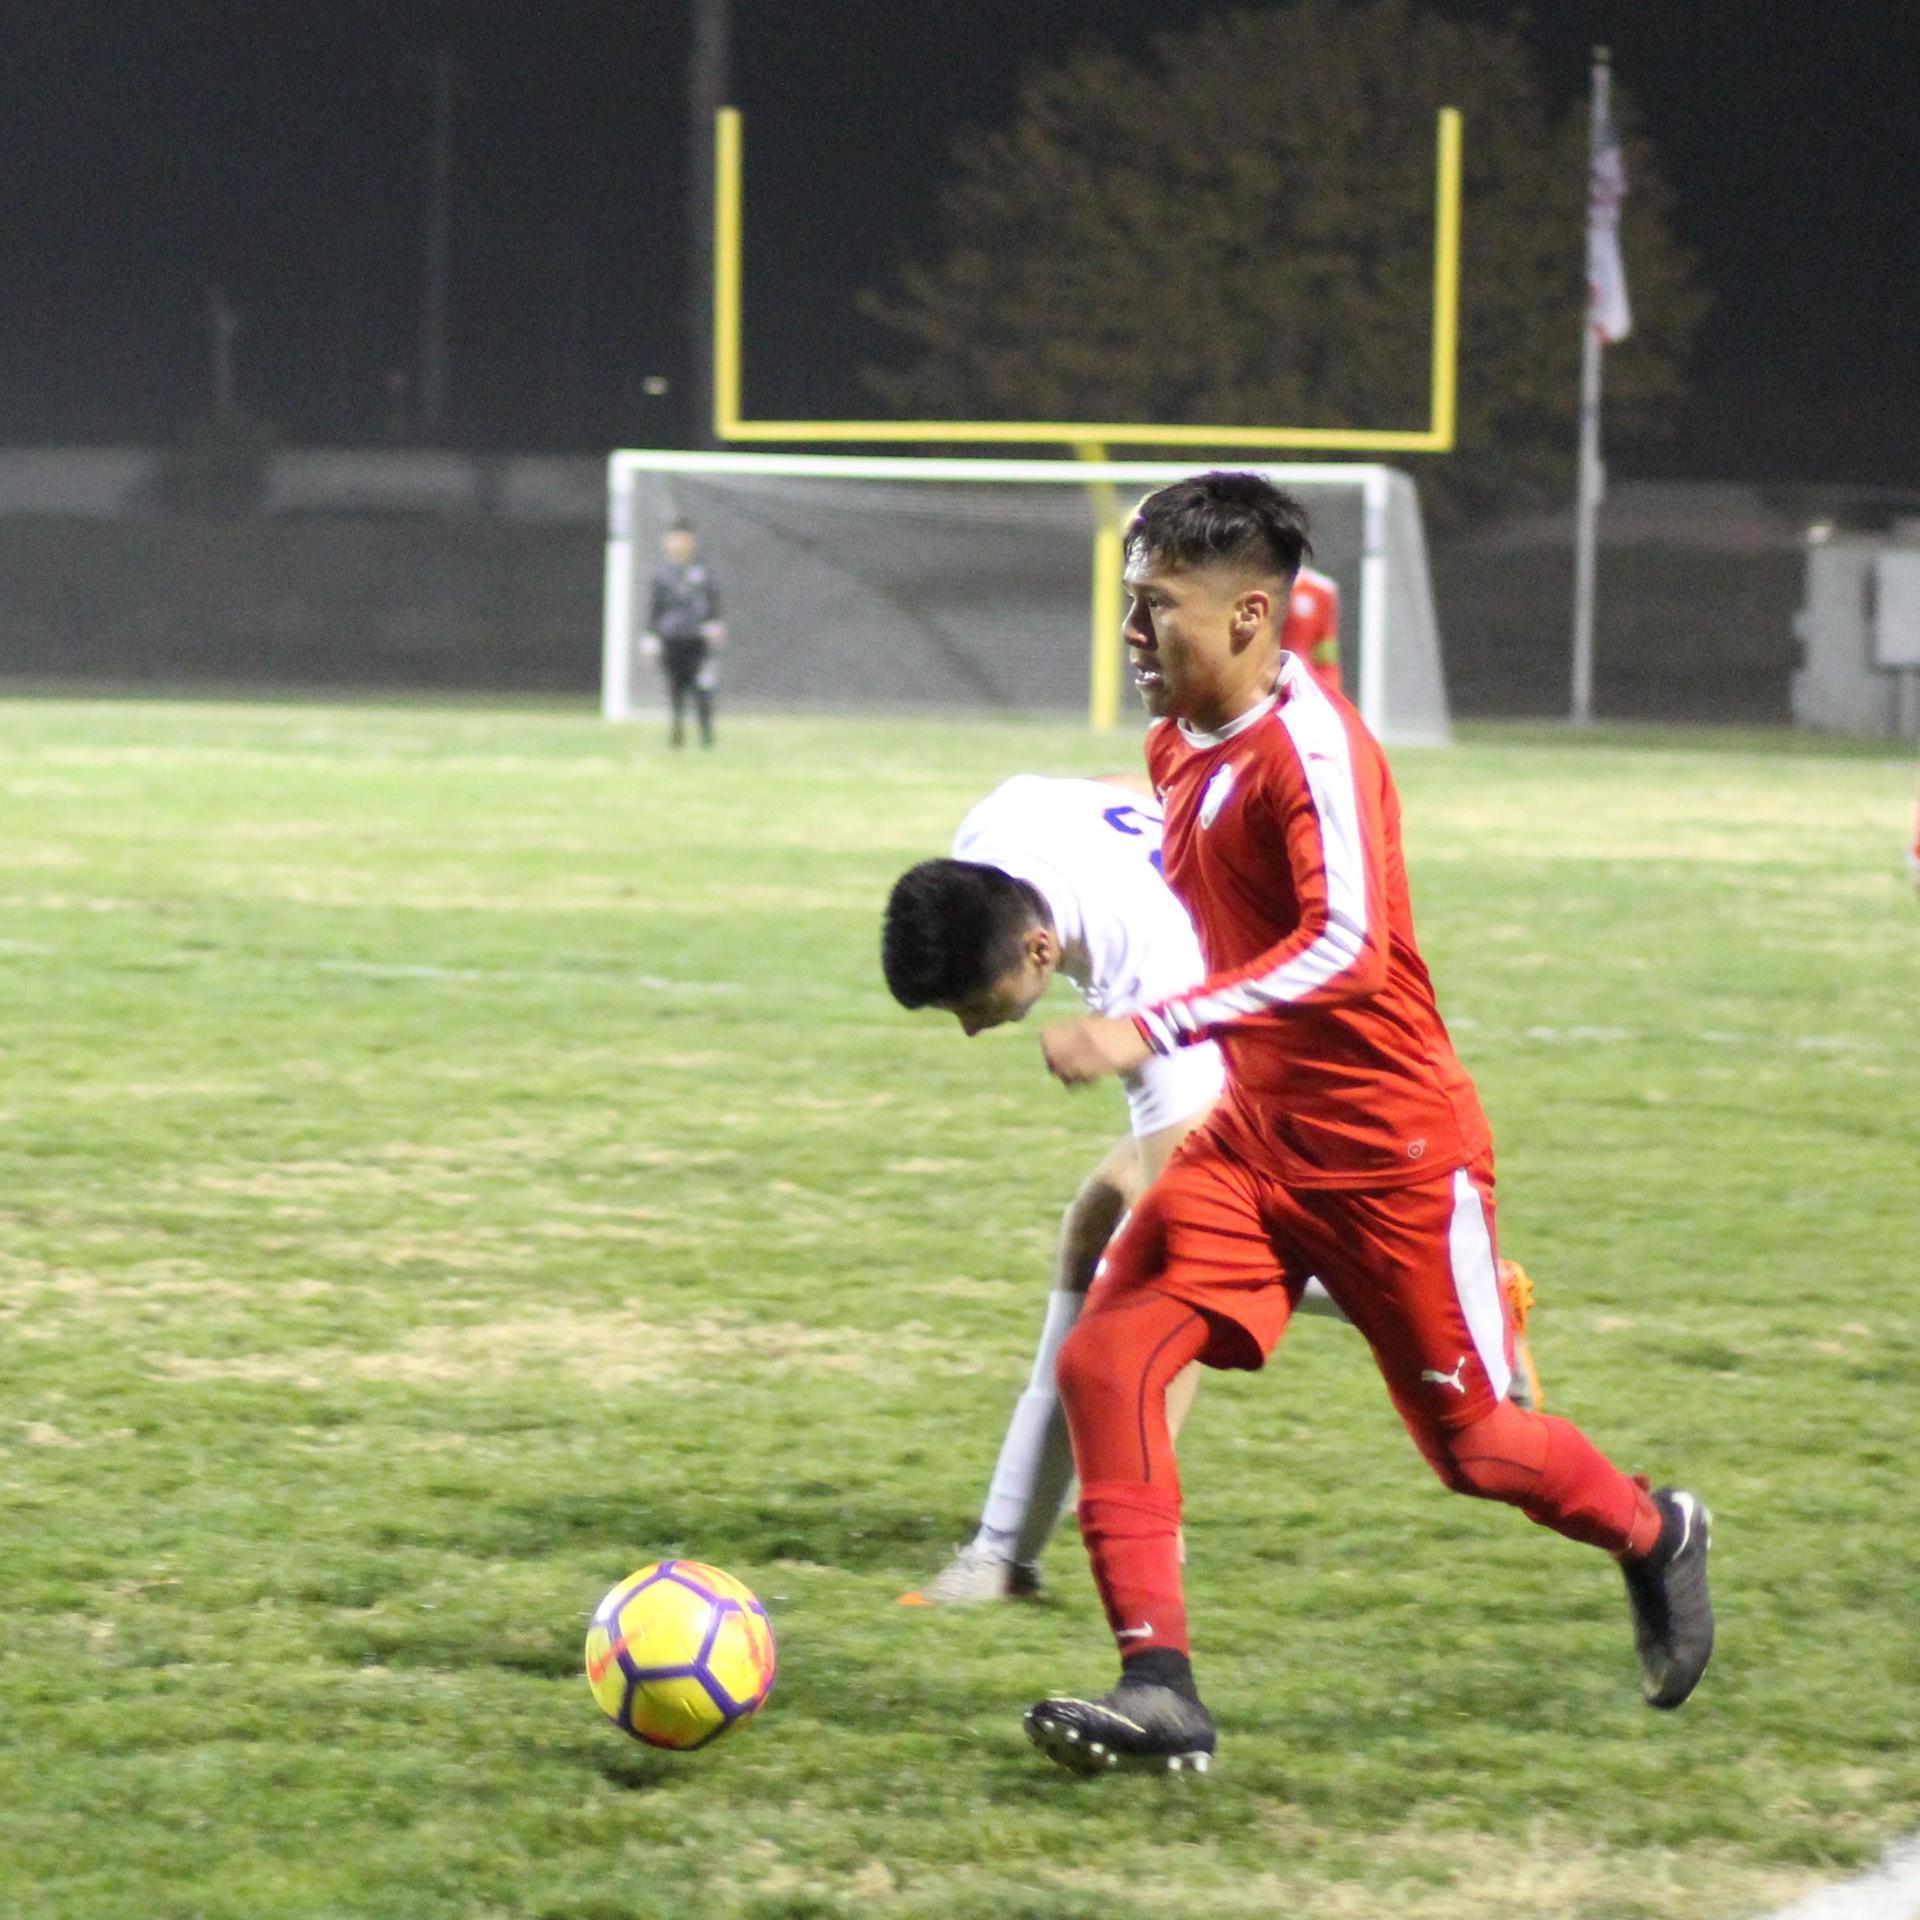 Edwin Reyes kicking the ball